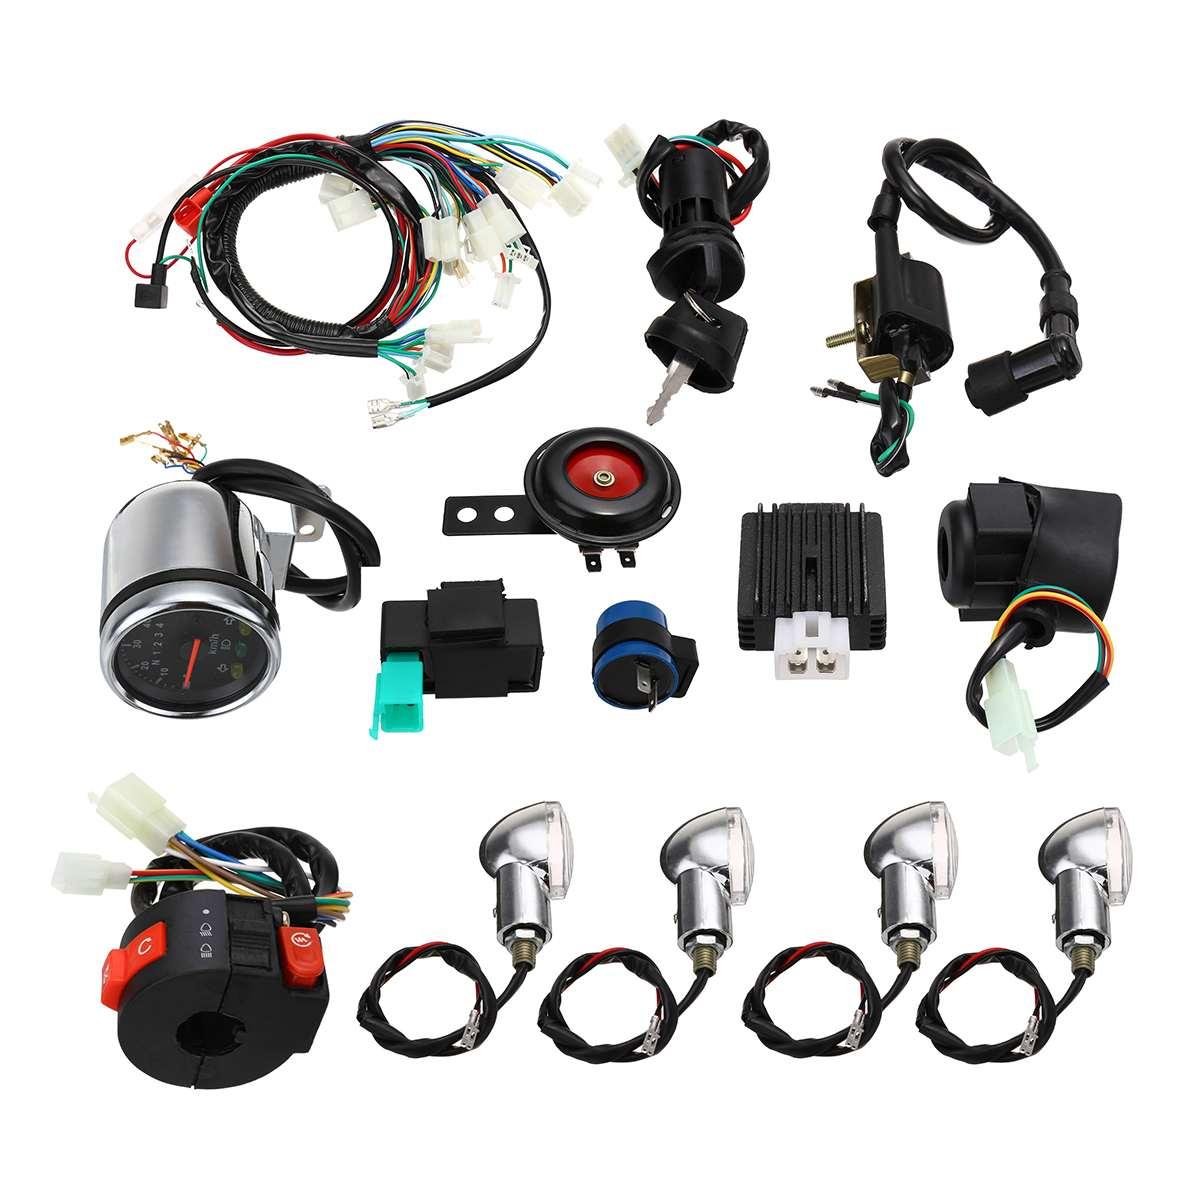 Motorcycle Full Electric CDI Start Engine Wiring Harness Loom Horn Turn Signal Light For 50cc 110cc 125cc Quad Dirt Bike ATV